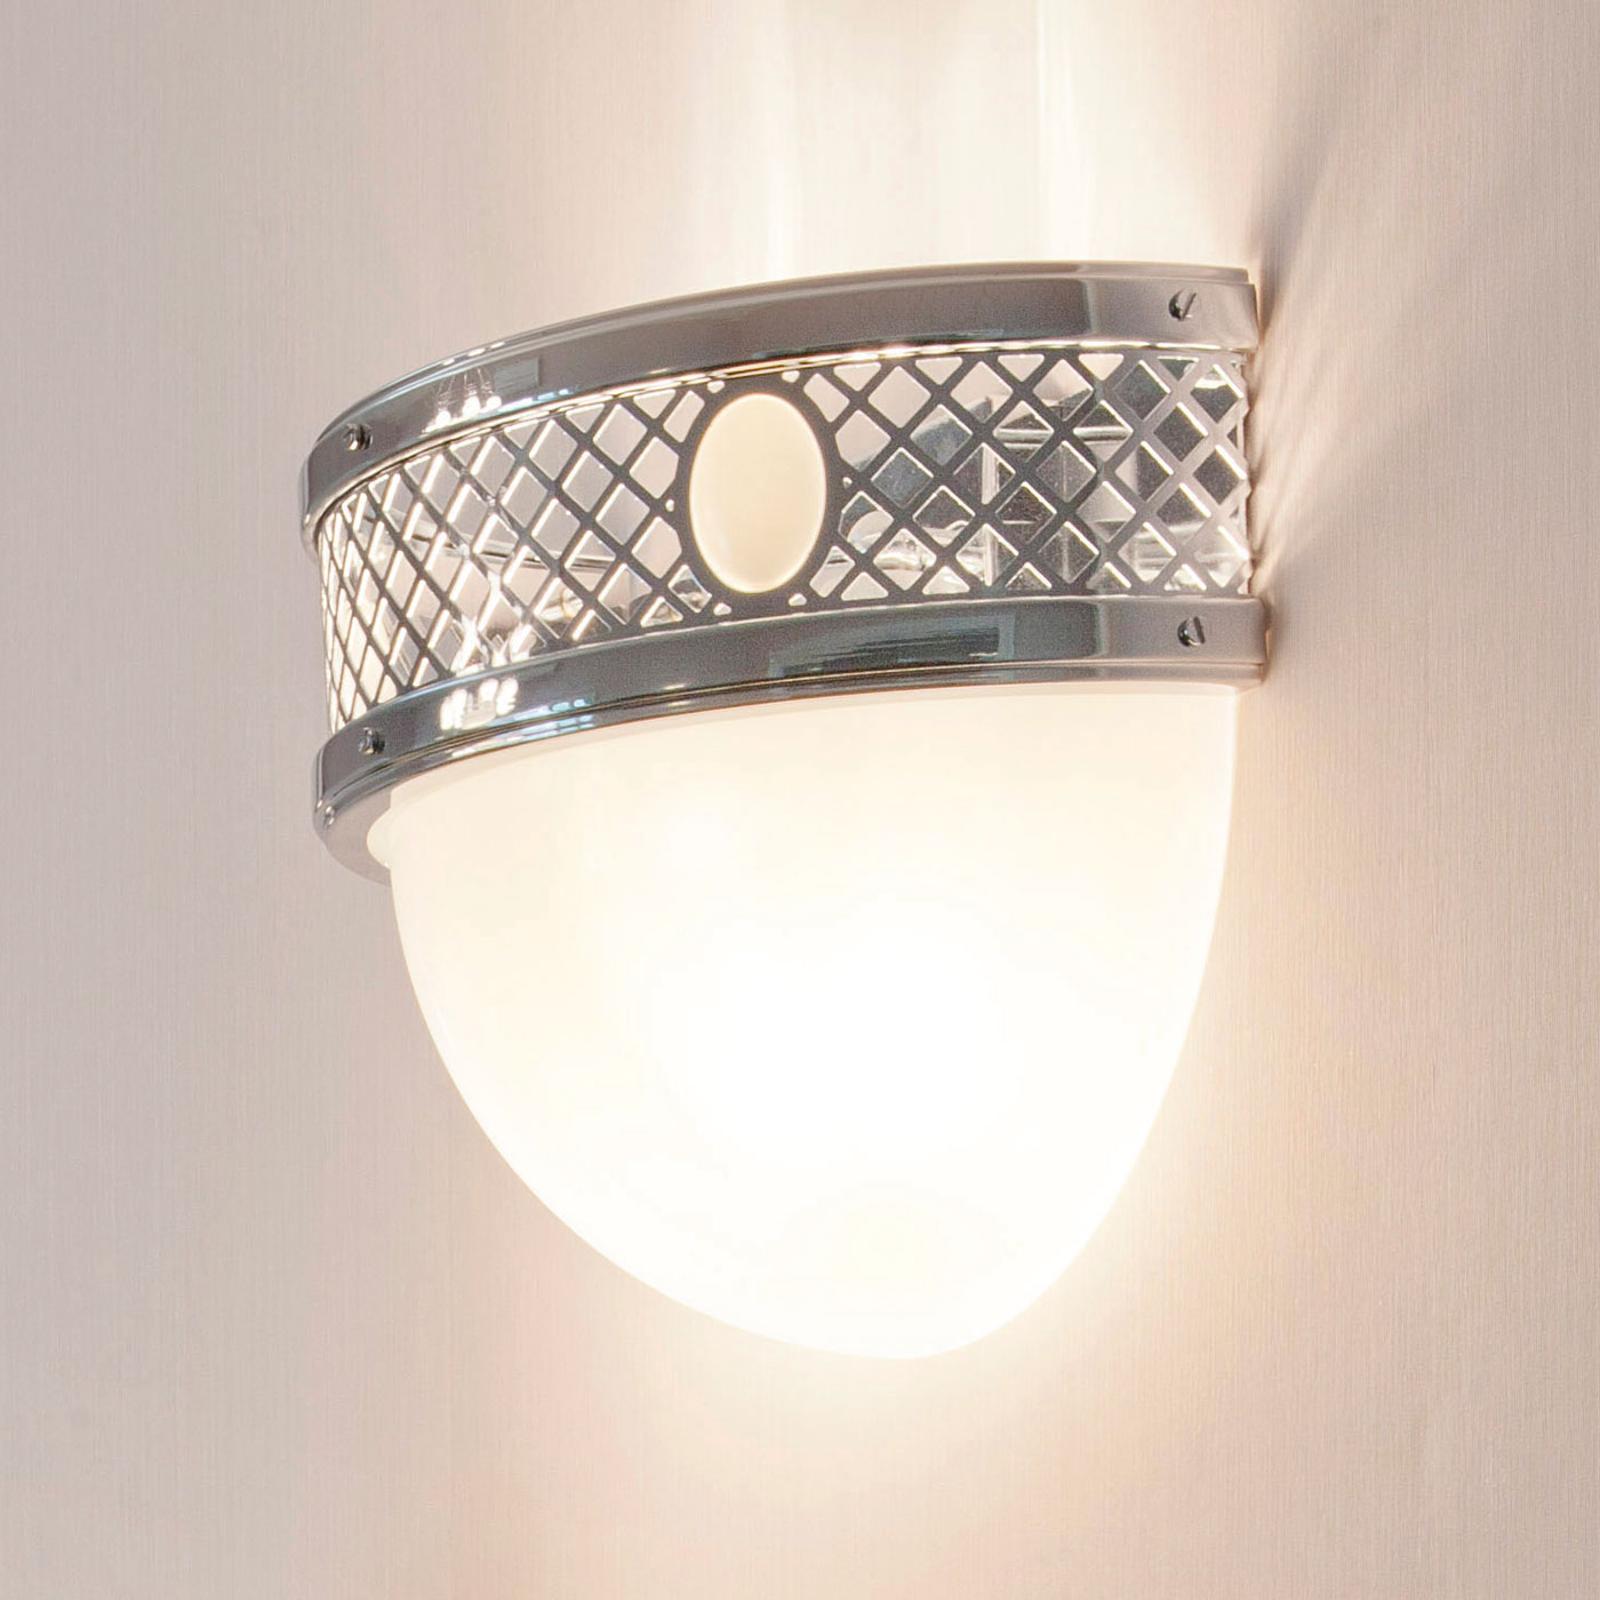 ALT WIEN - halfronde wandlamp, glanzend nikkel